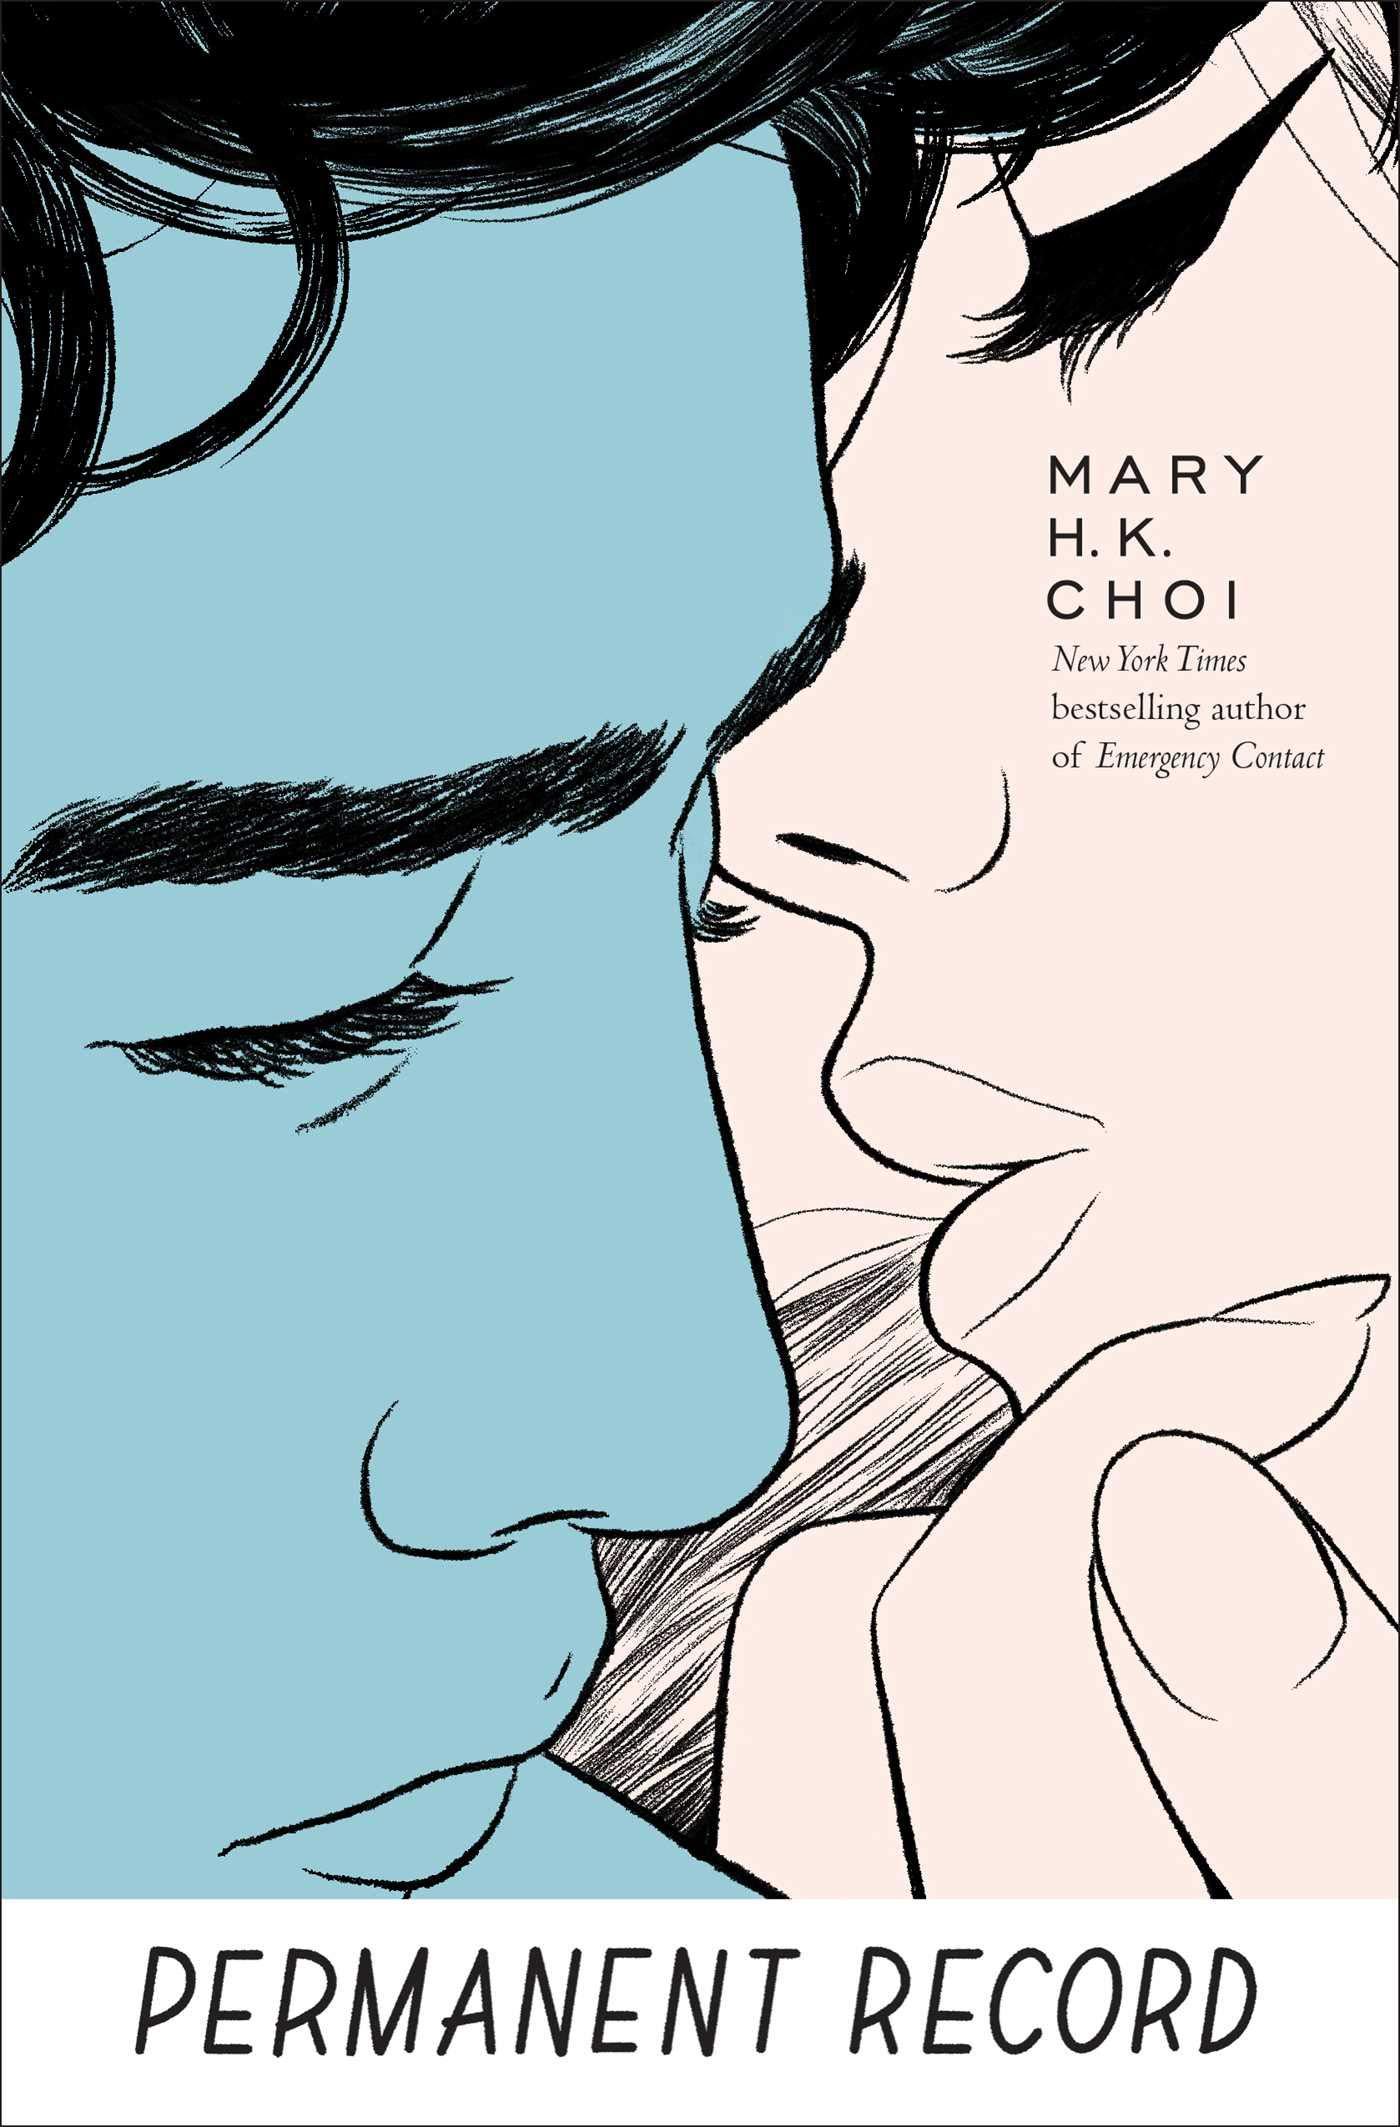 Permanent Record: Amazon.it: Choi, Mary H. K.: Libri in